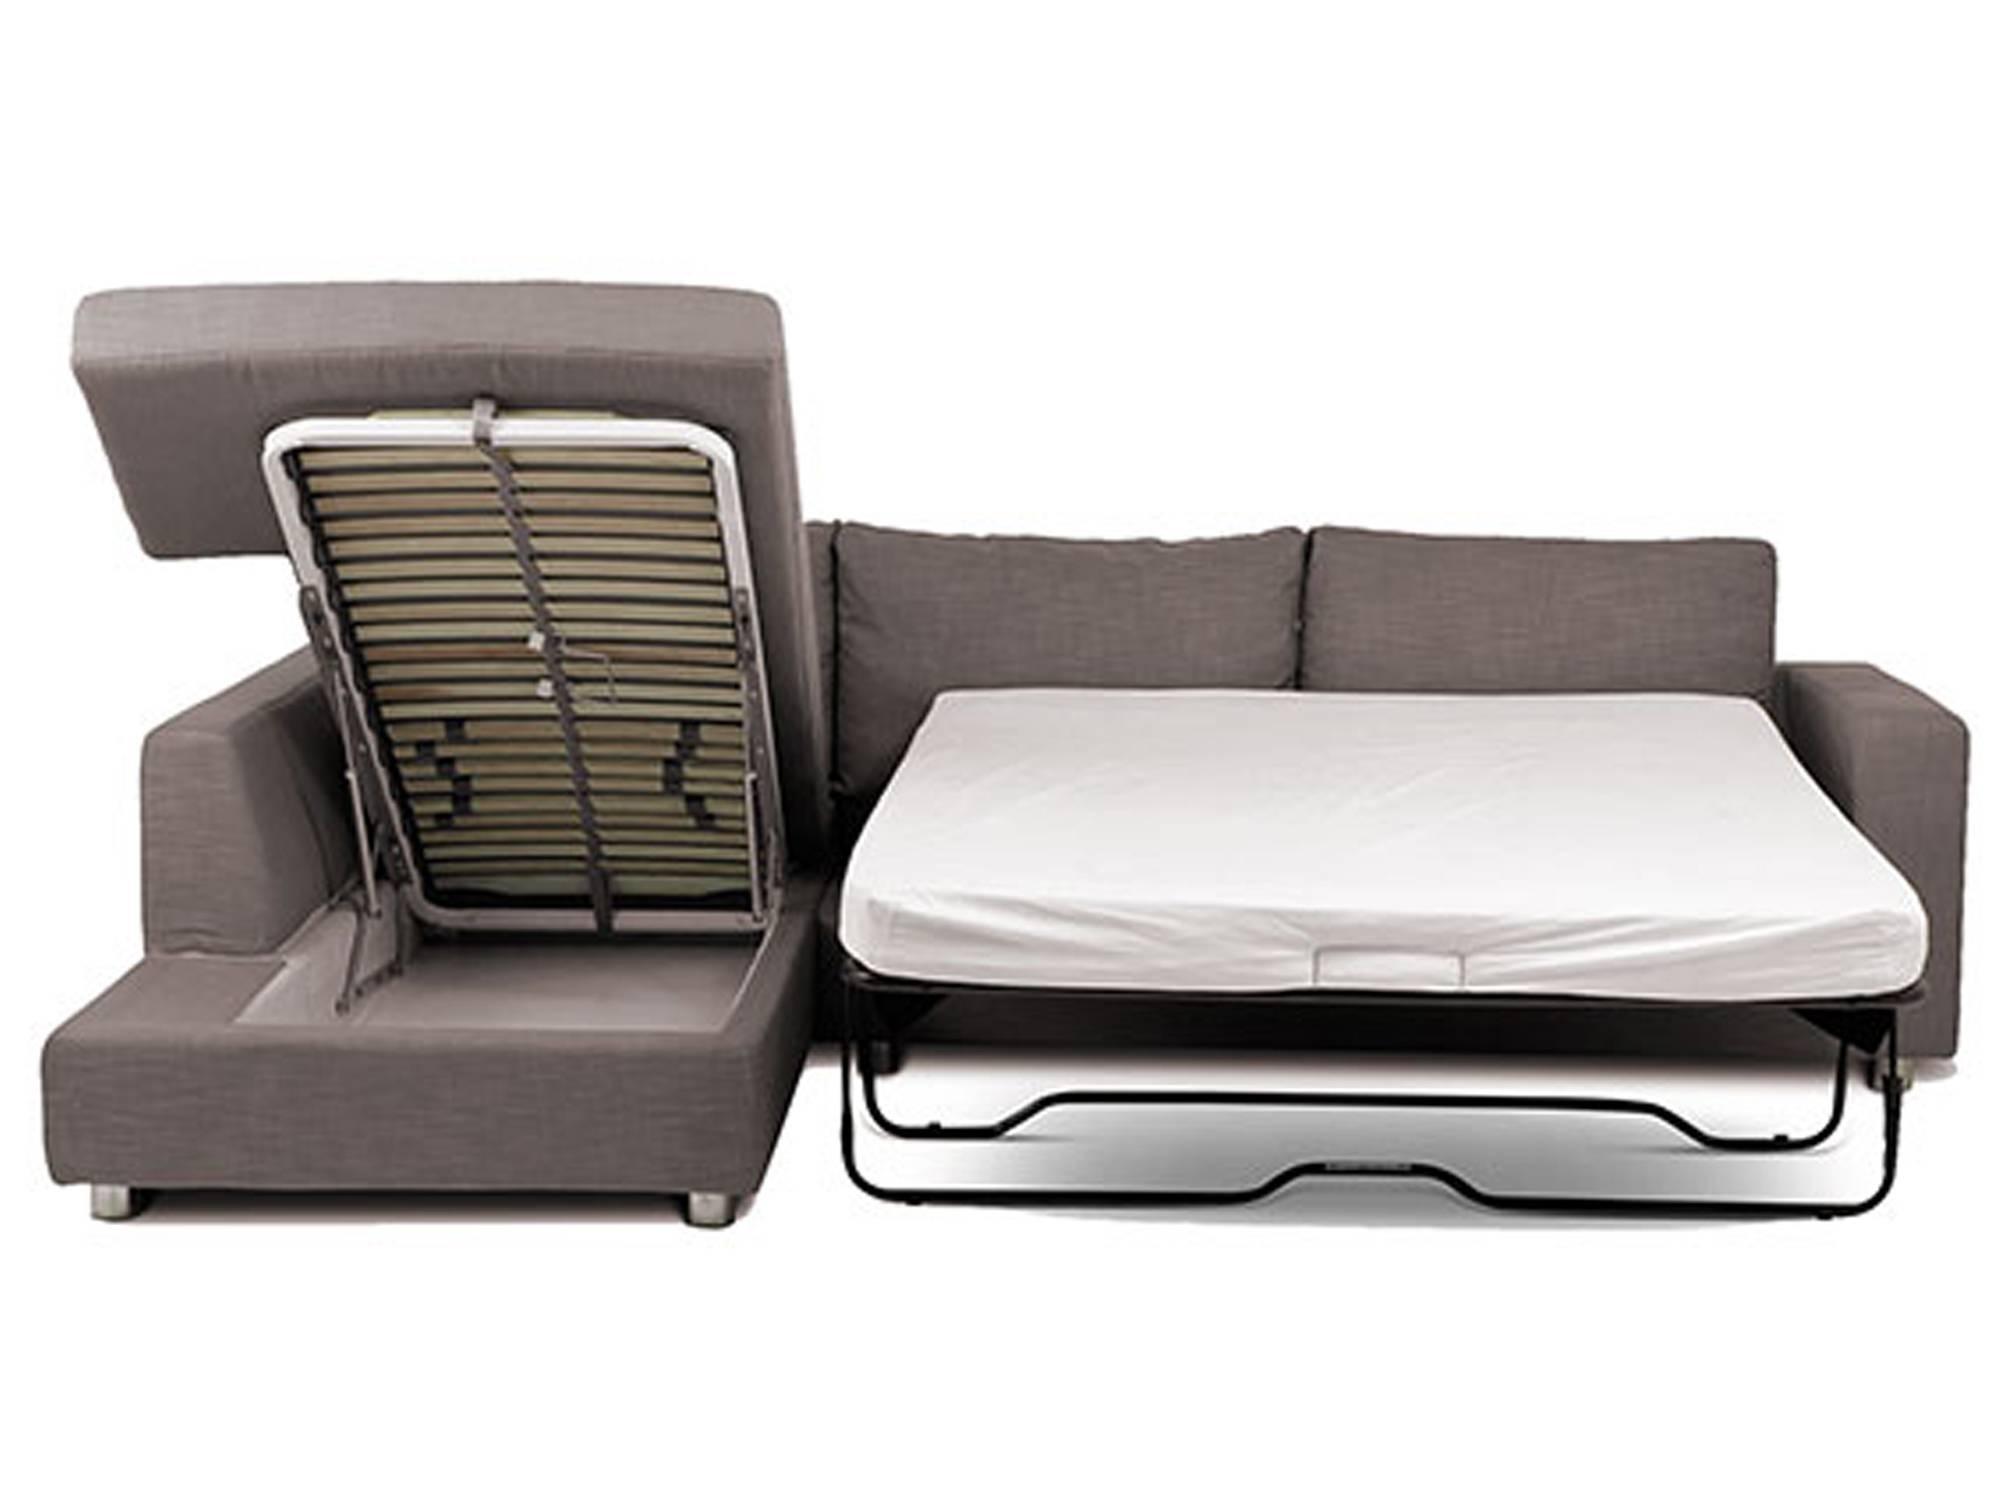 Sofas: Ikea Loveseat | Chaise Sofa Bed | Memory Foam Sleeper Sofa intended for Corner Sleeper Sofas (Image 14 of 15)